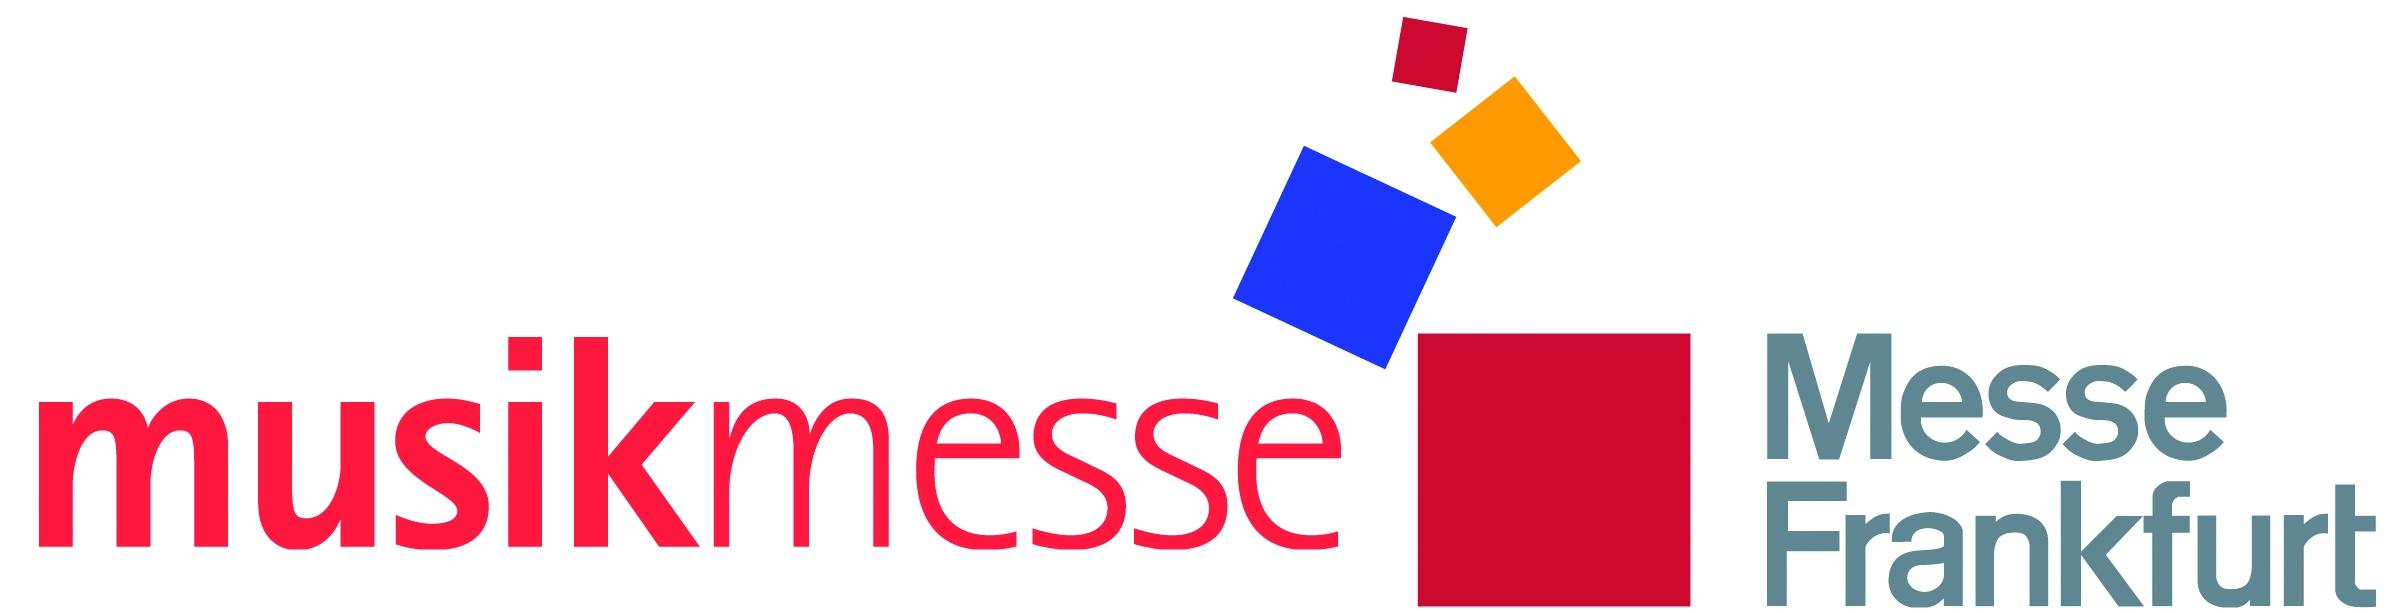 musikmesse-logo57adab7e72ed2